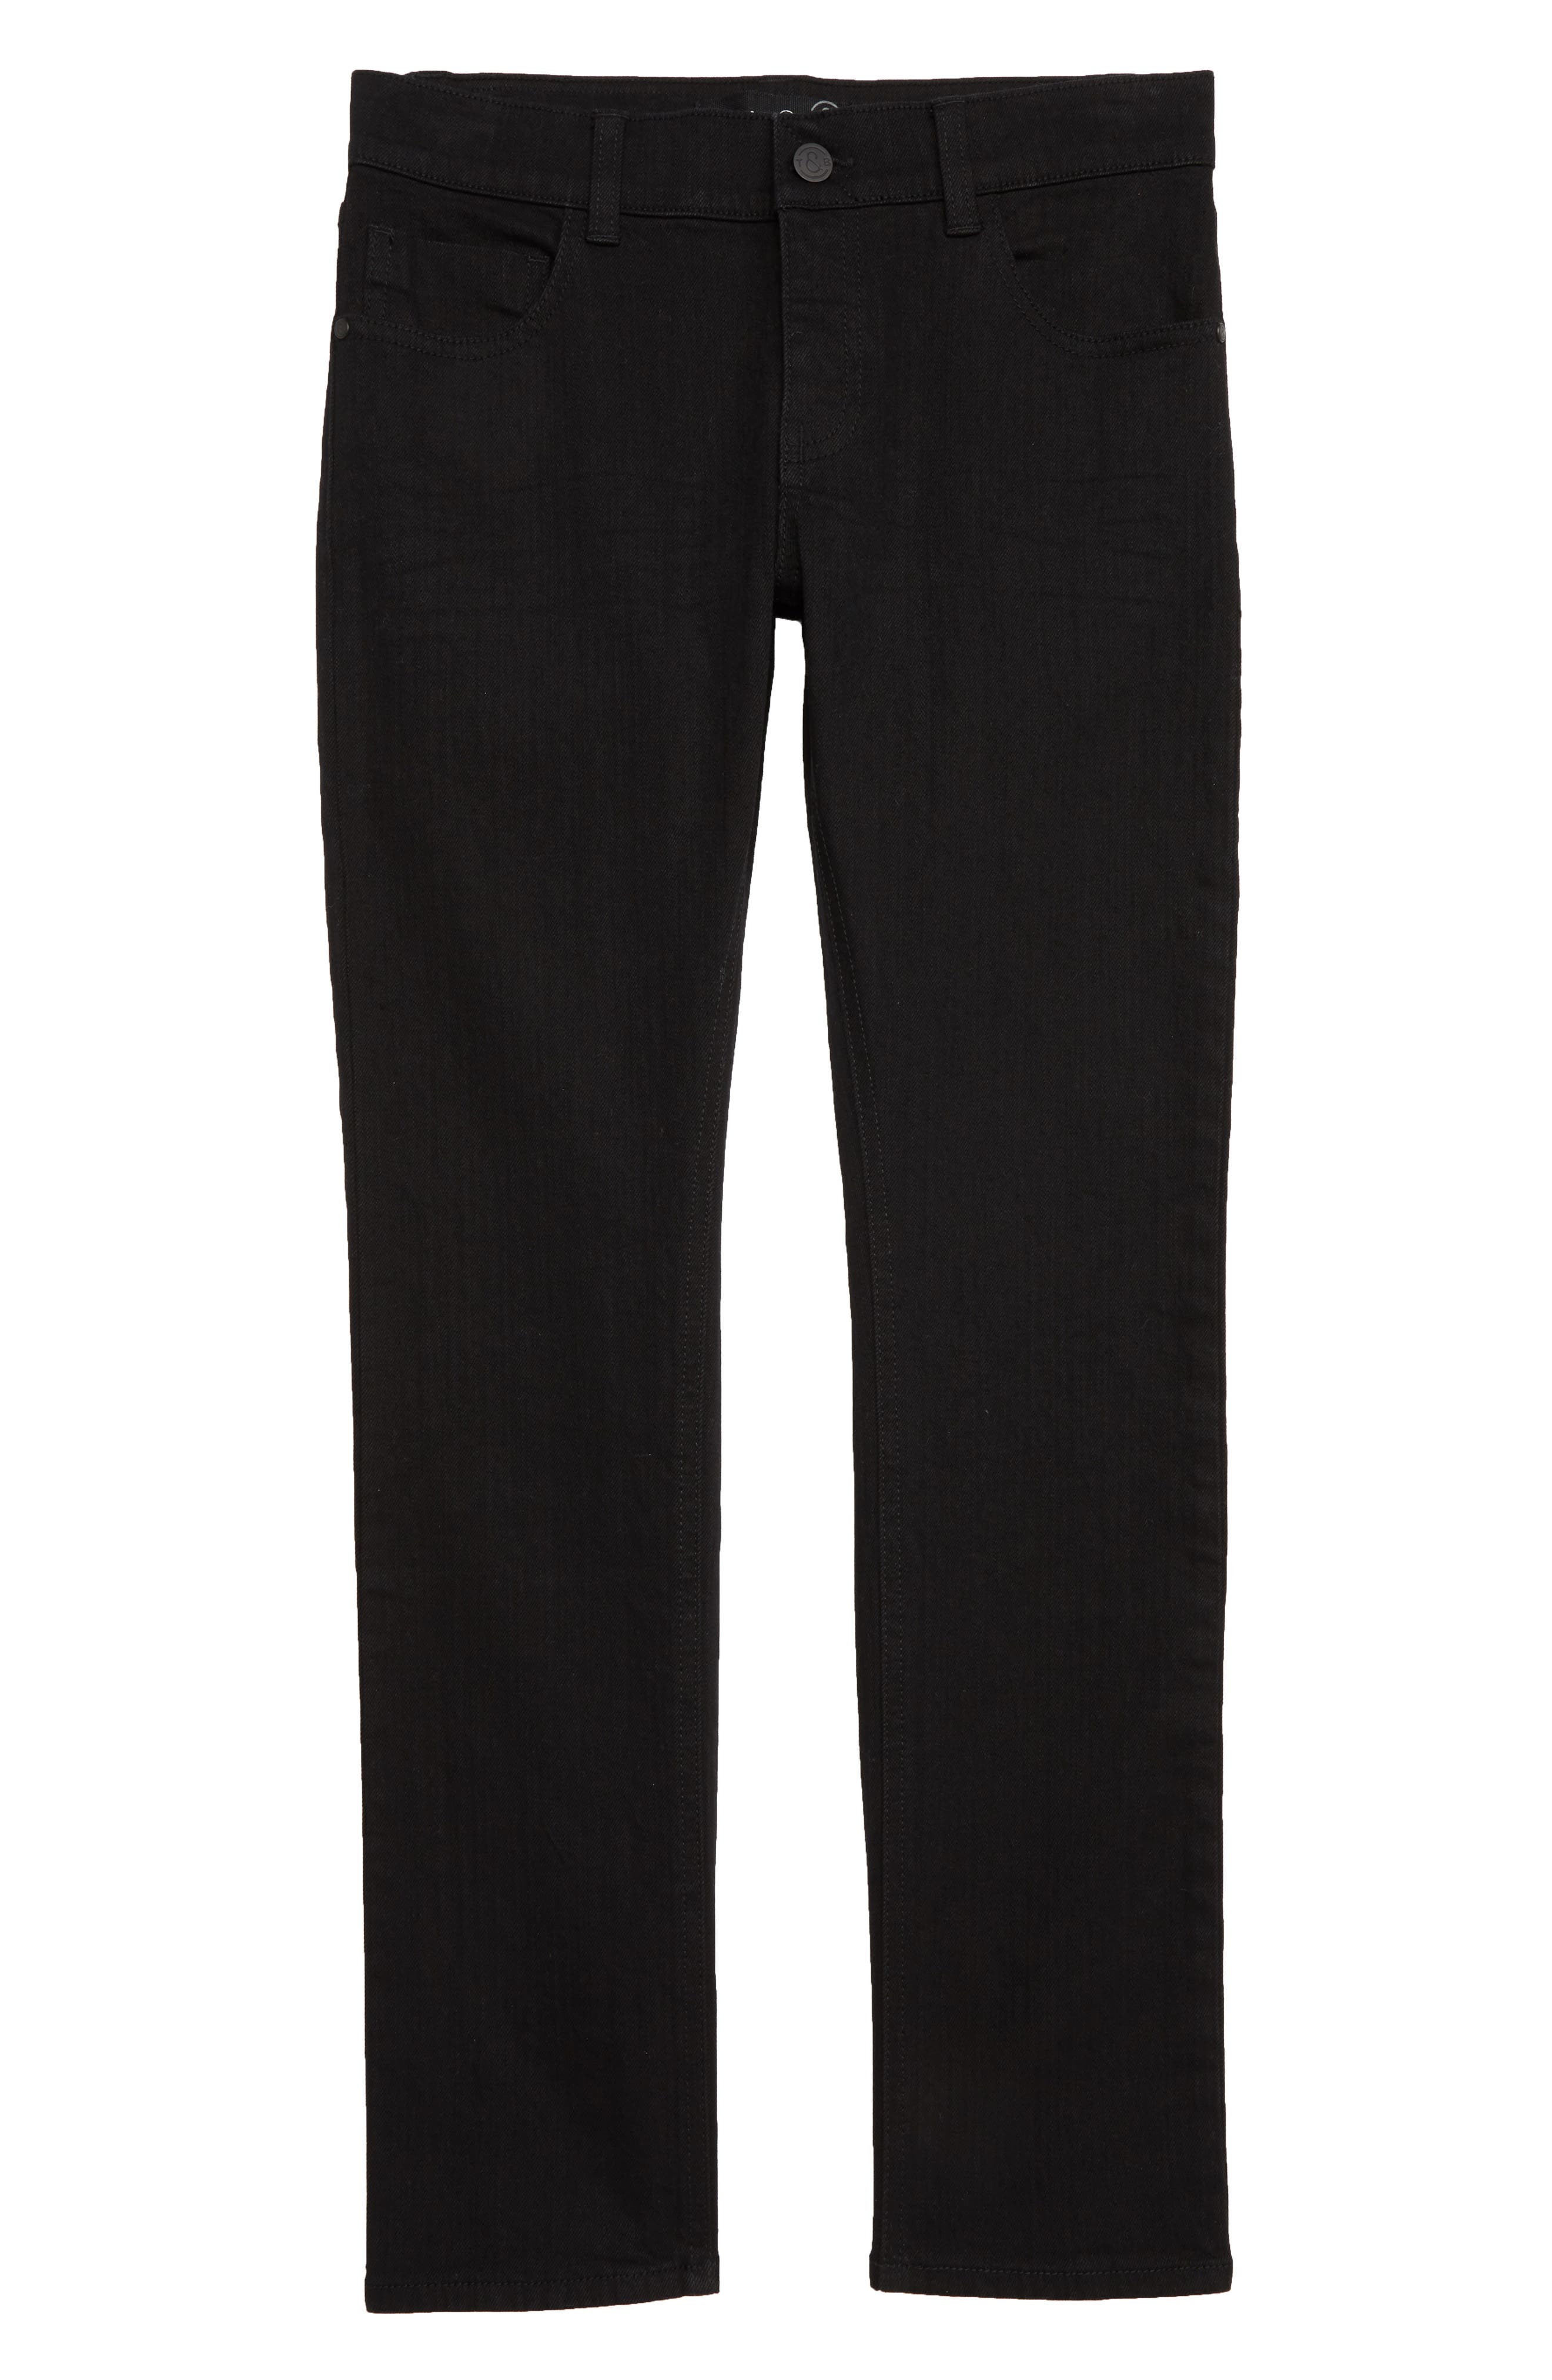 Skinny Jeans,                             Main thumbnail 1, color,                             EASY BLACK WASH